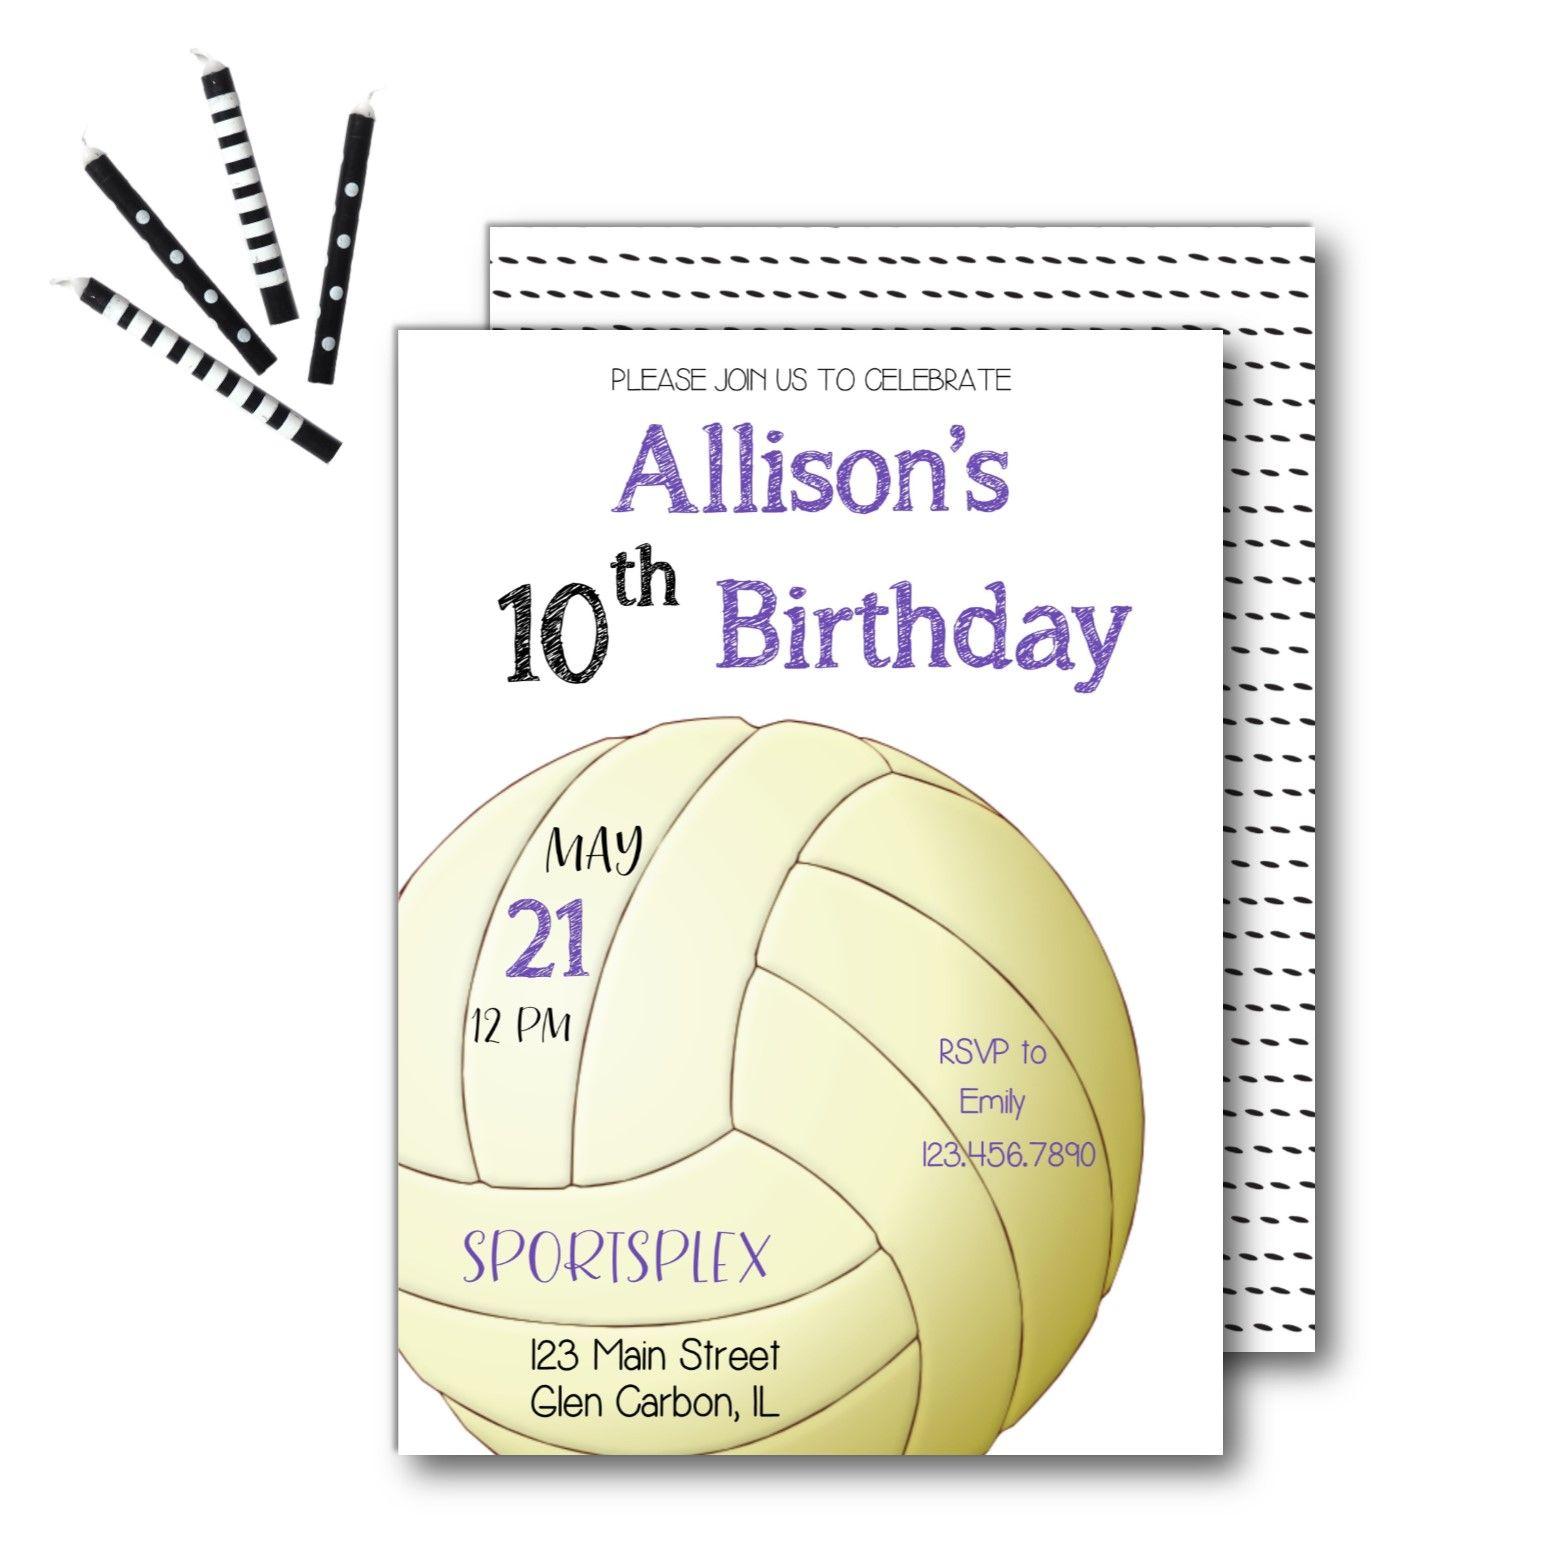 Volleyball Birthday Invitation Birthday Invitations Kids Birthday Invitations Personalized Invitations